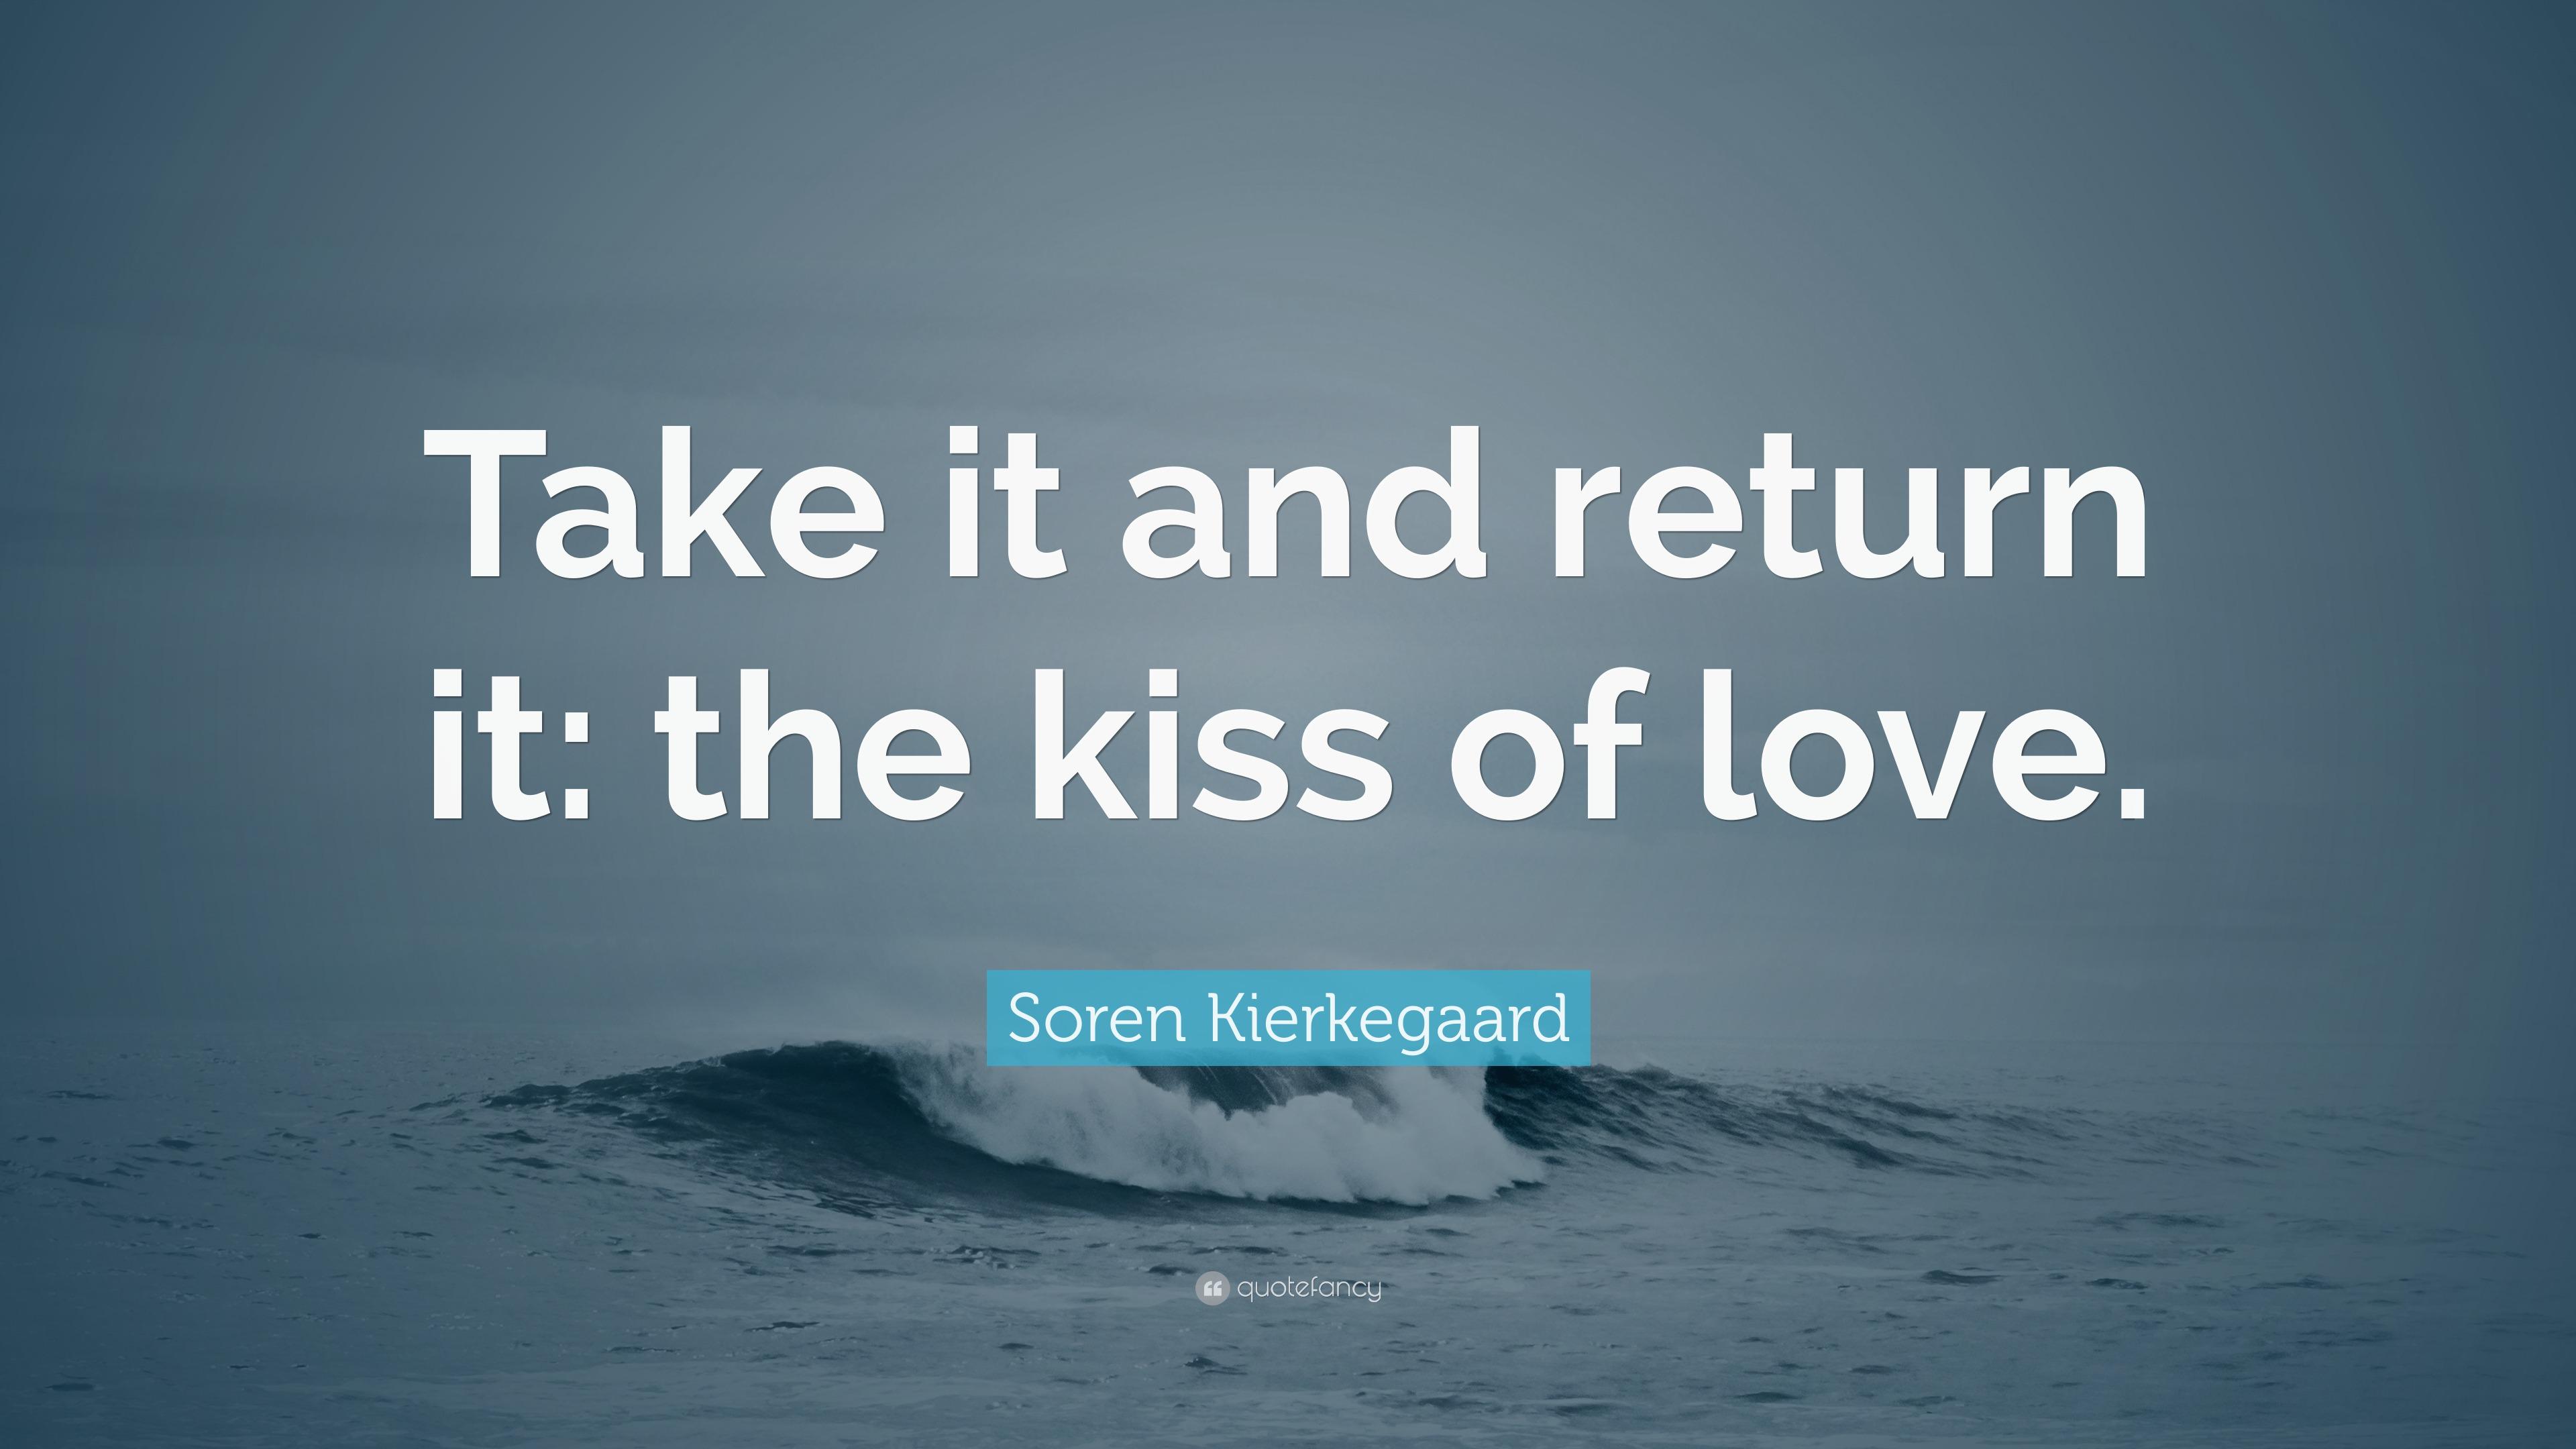 Soren Kierkegaard Quote: U201cTake It And Return It: The Kiss Of Love.